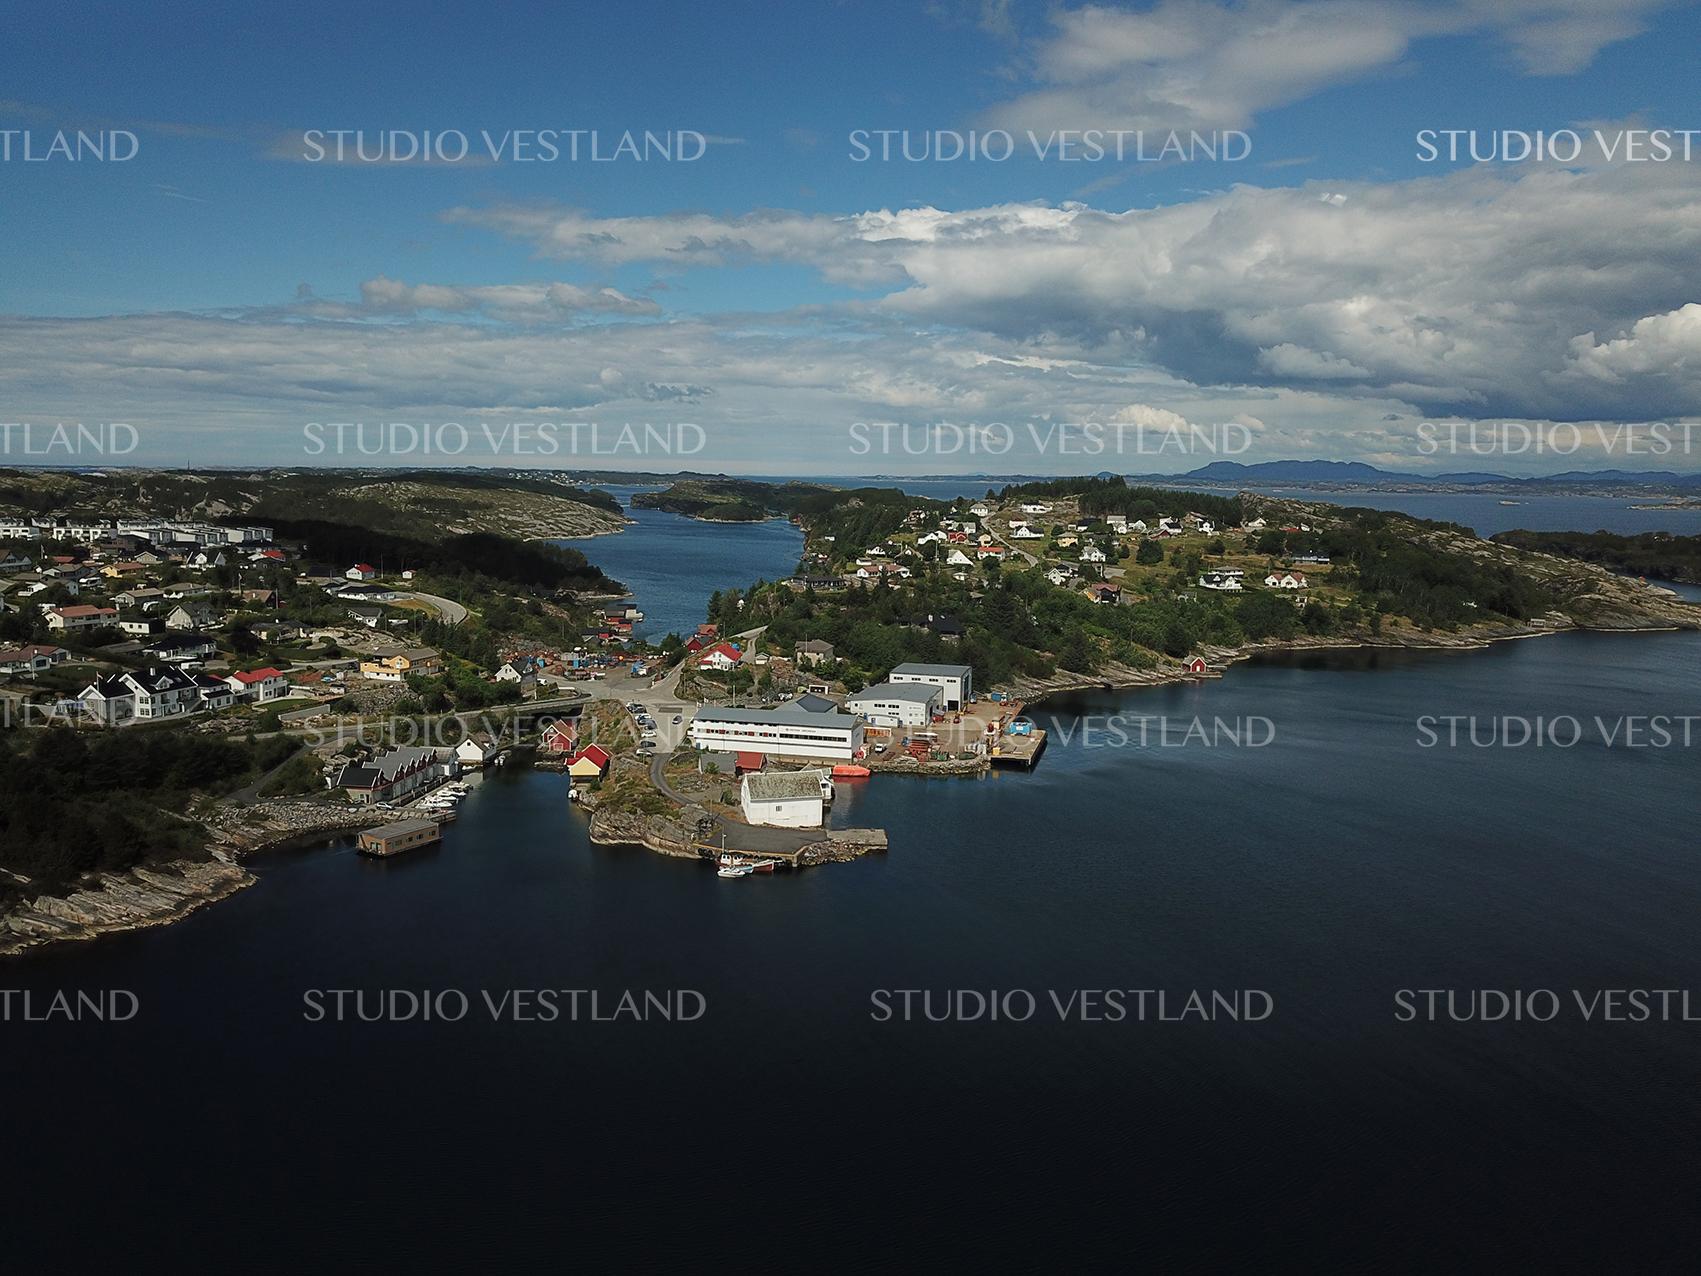 Studio Vestland - Ågotnes 11